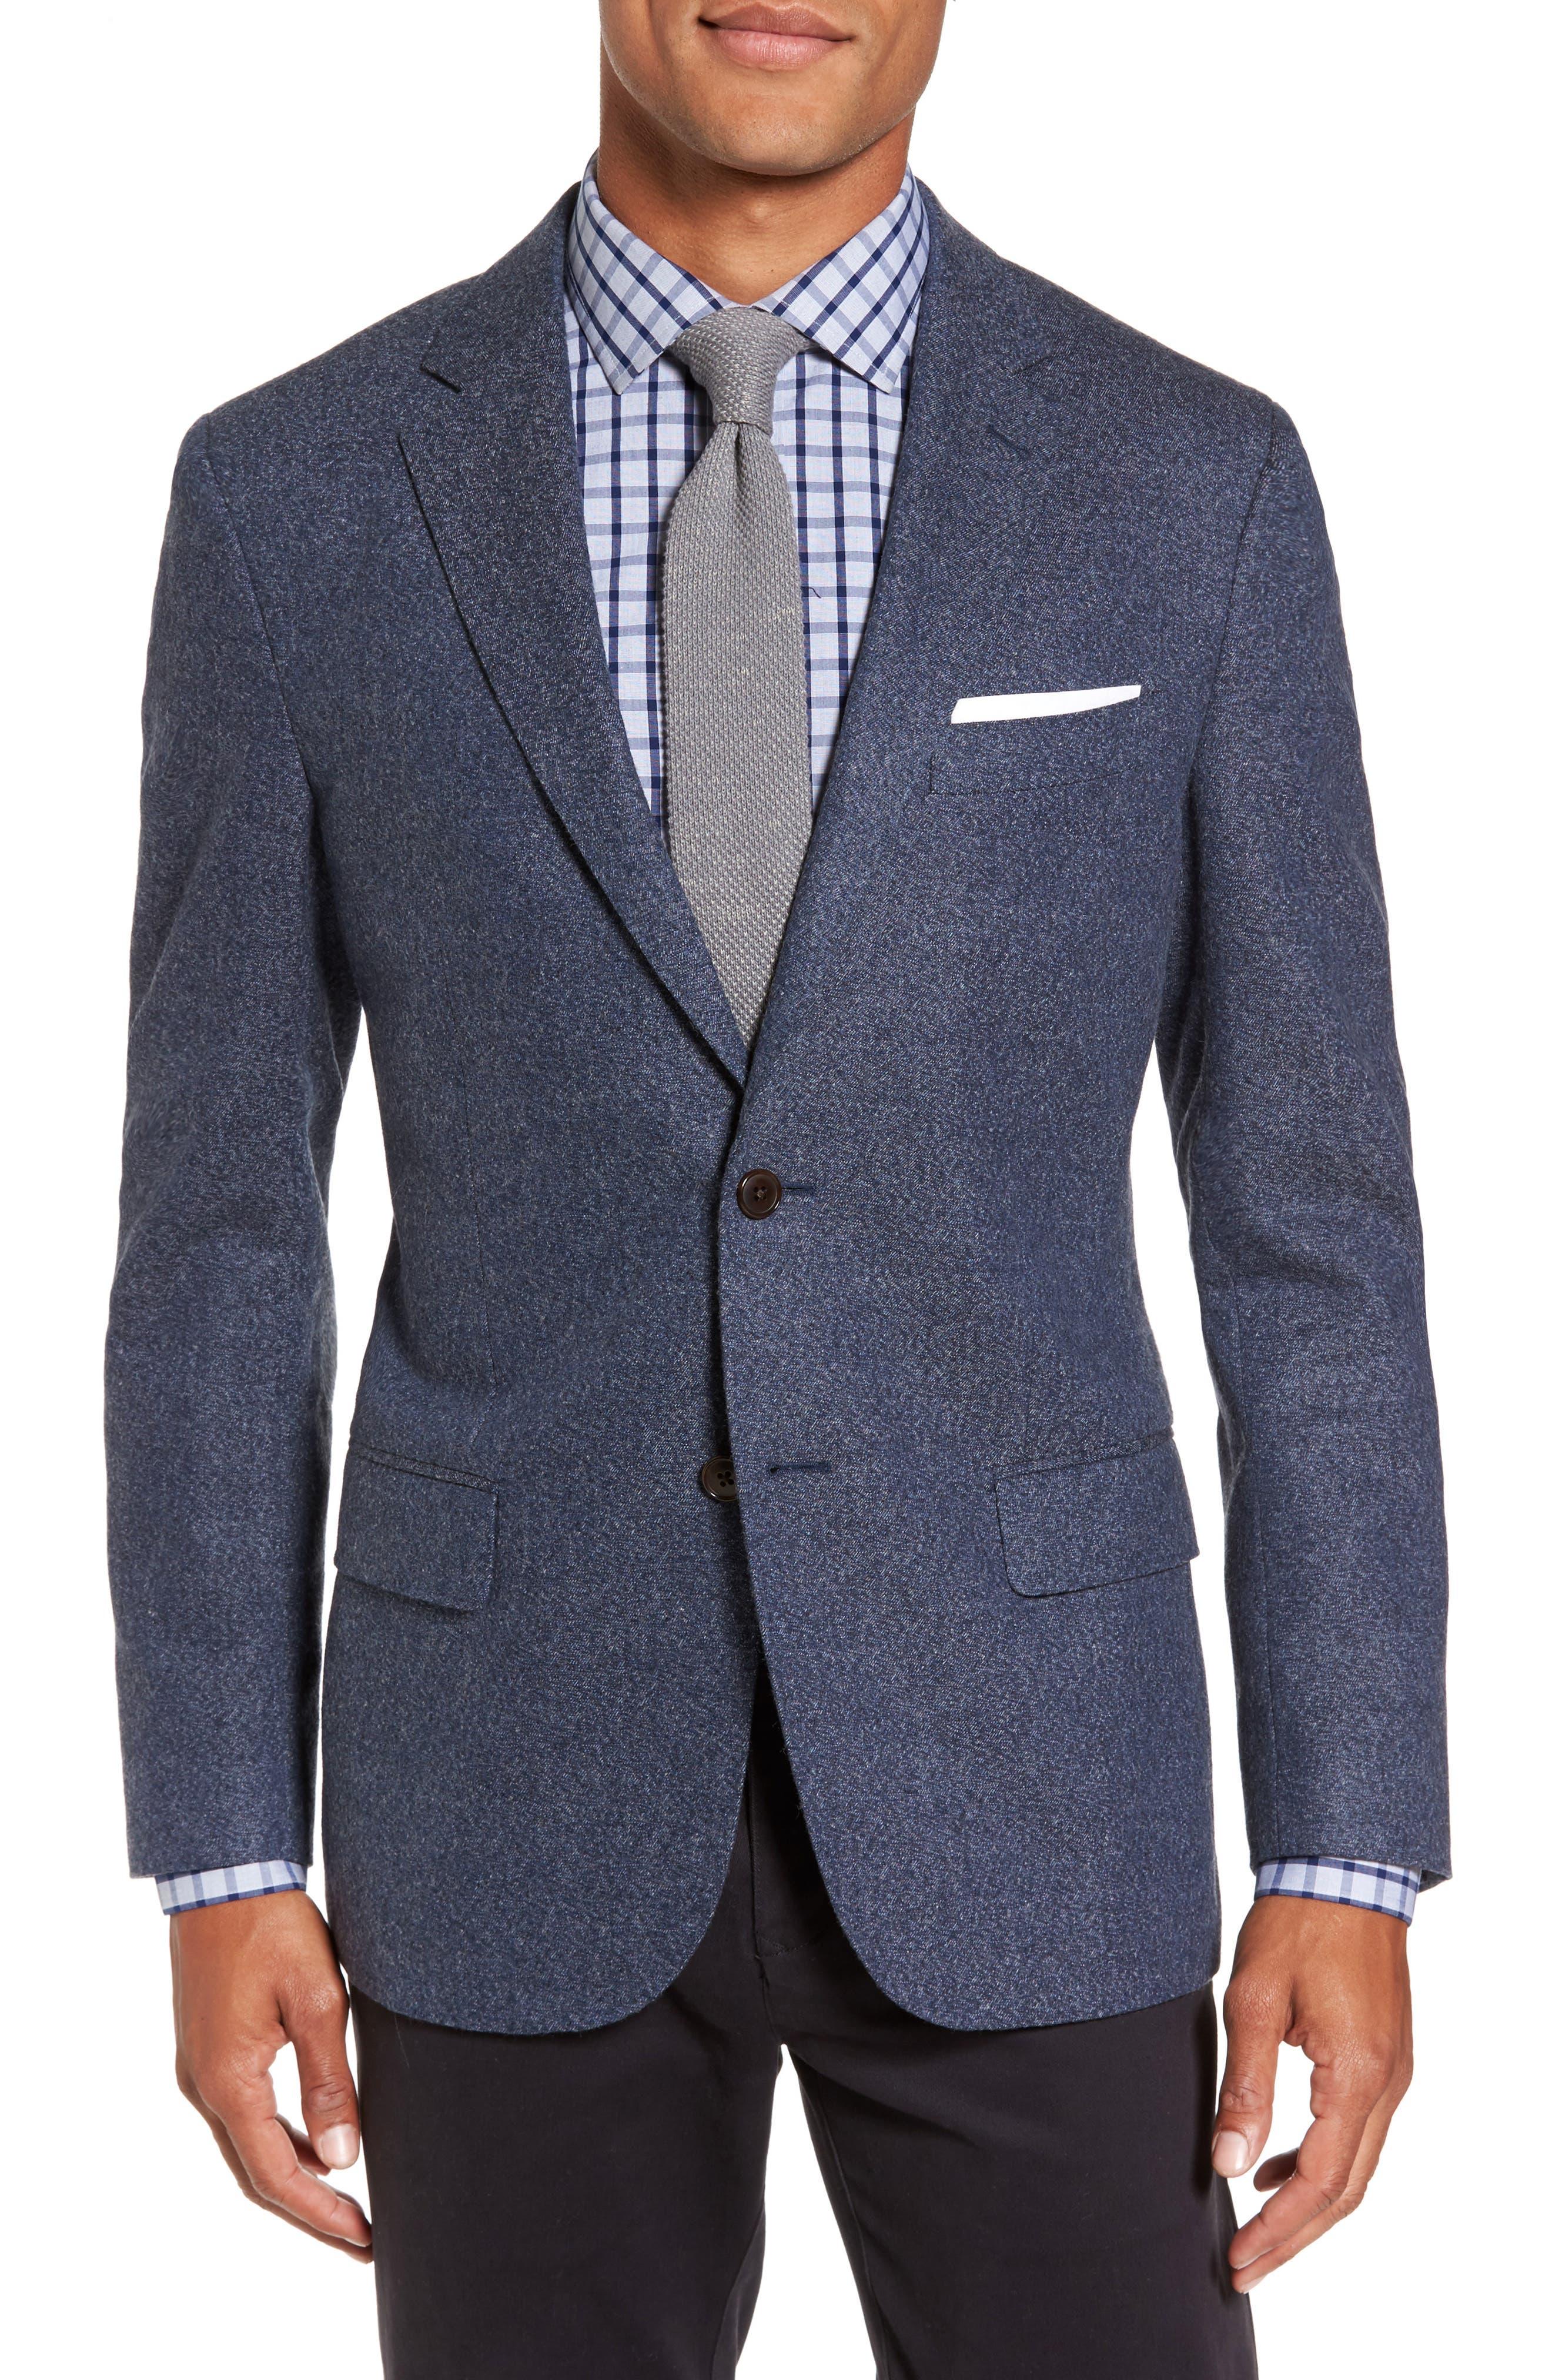 Charleston Wool Blend Sport Coat,                             Main thumbnail 1, color,                             414